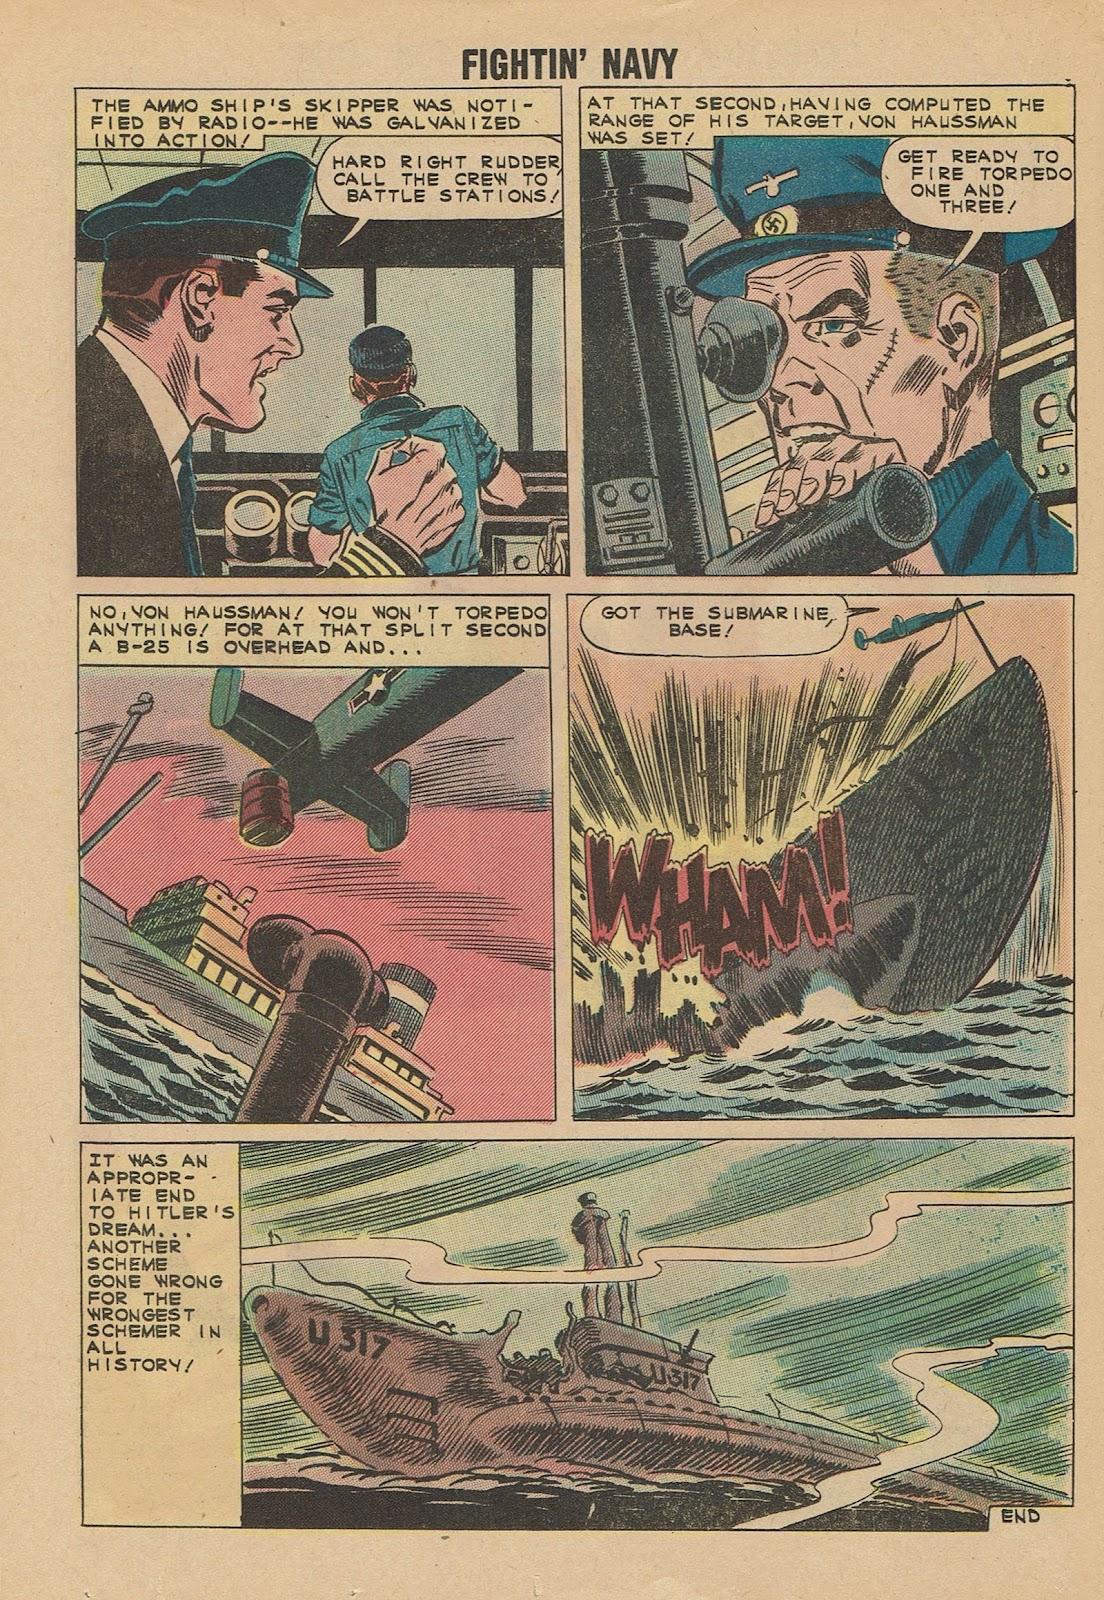 Read online Fightin' Navy comic -  Issue #101 - 20